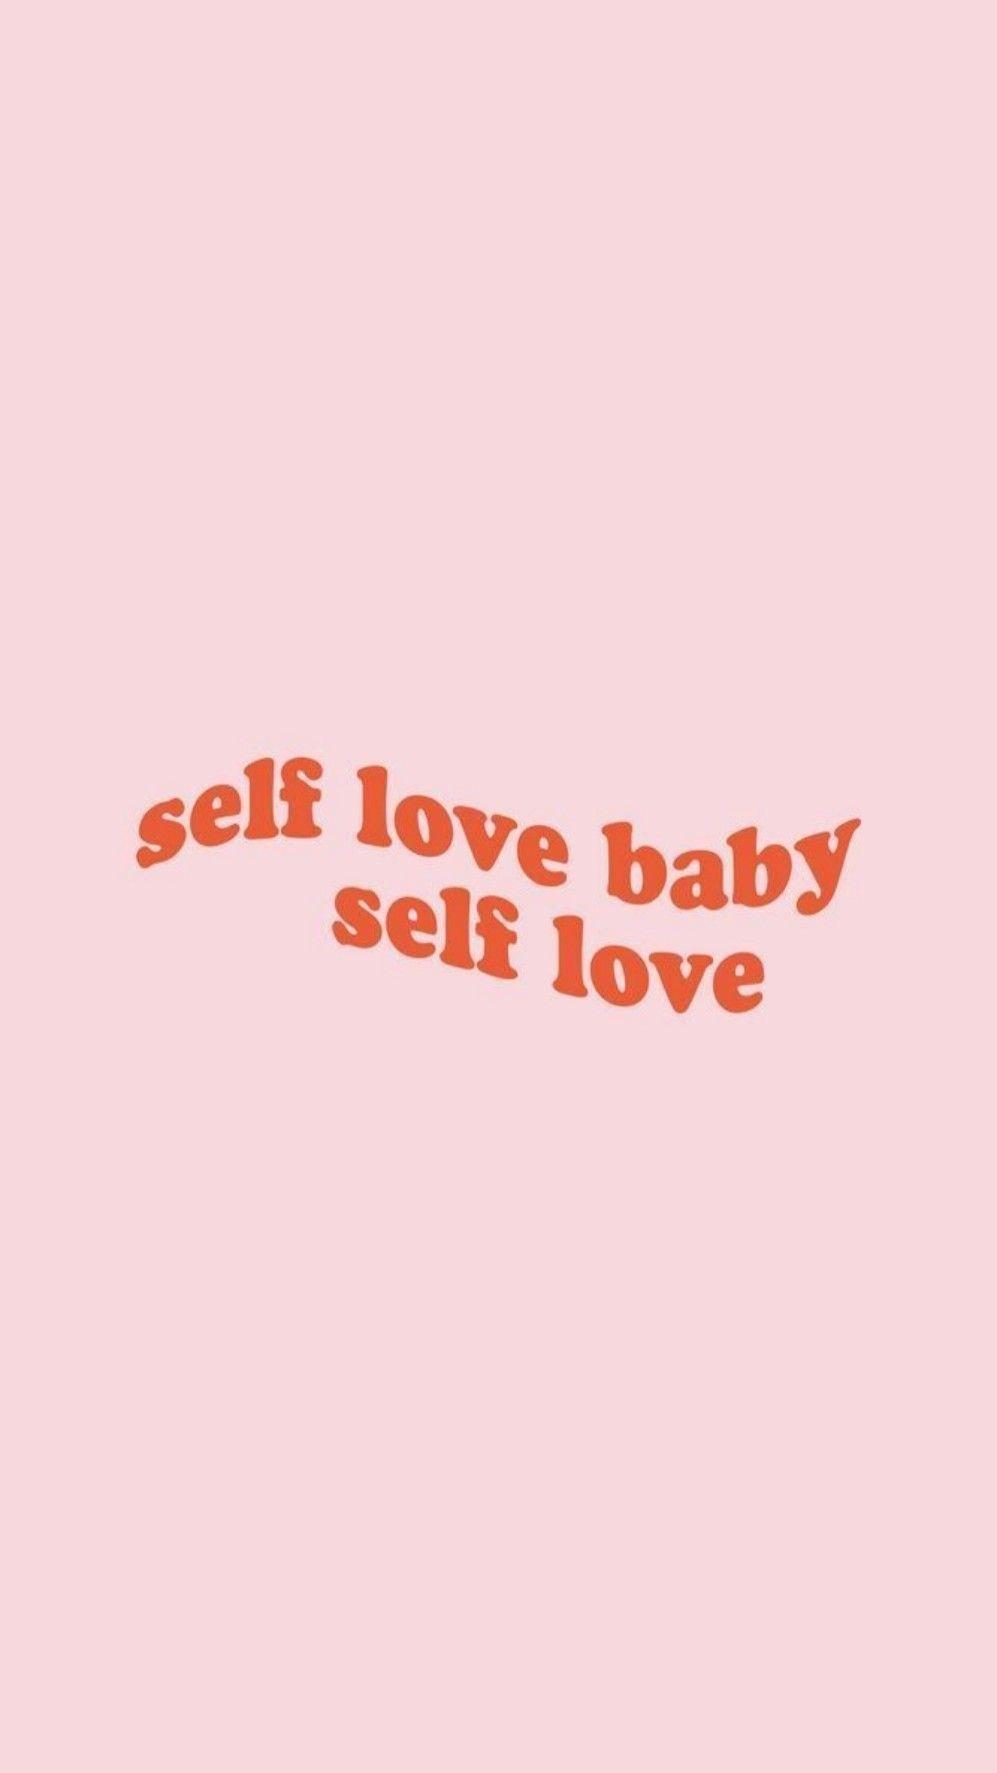 Pastel Wallpaper Self Love Baby Self Love Love Wallpaper Self Aesthetic self love wallpaper